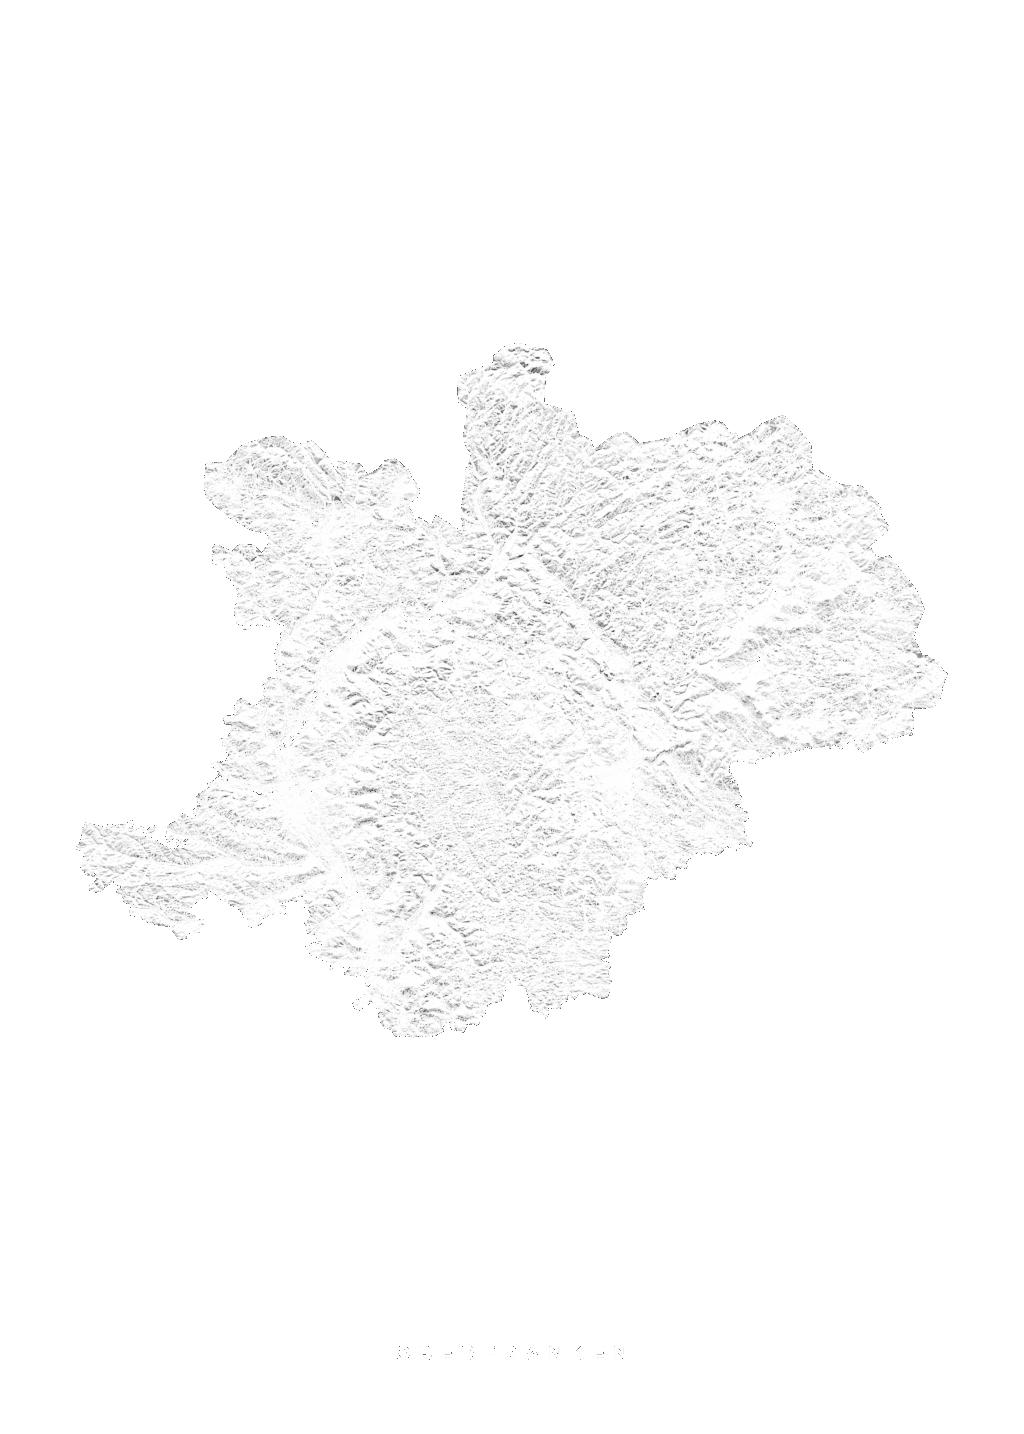 Oberfranken wall map